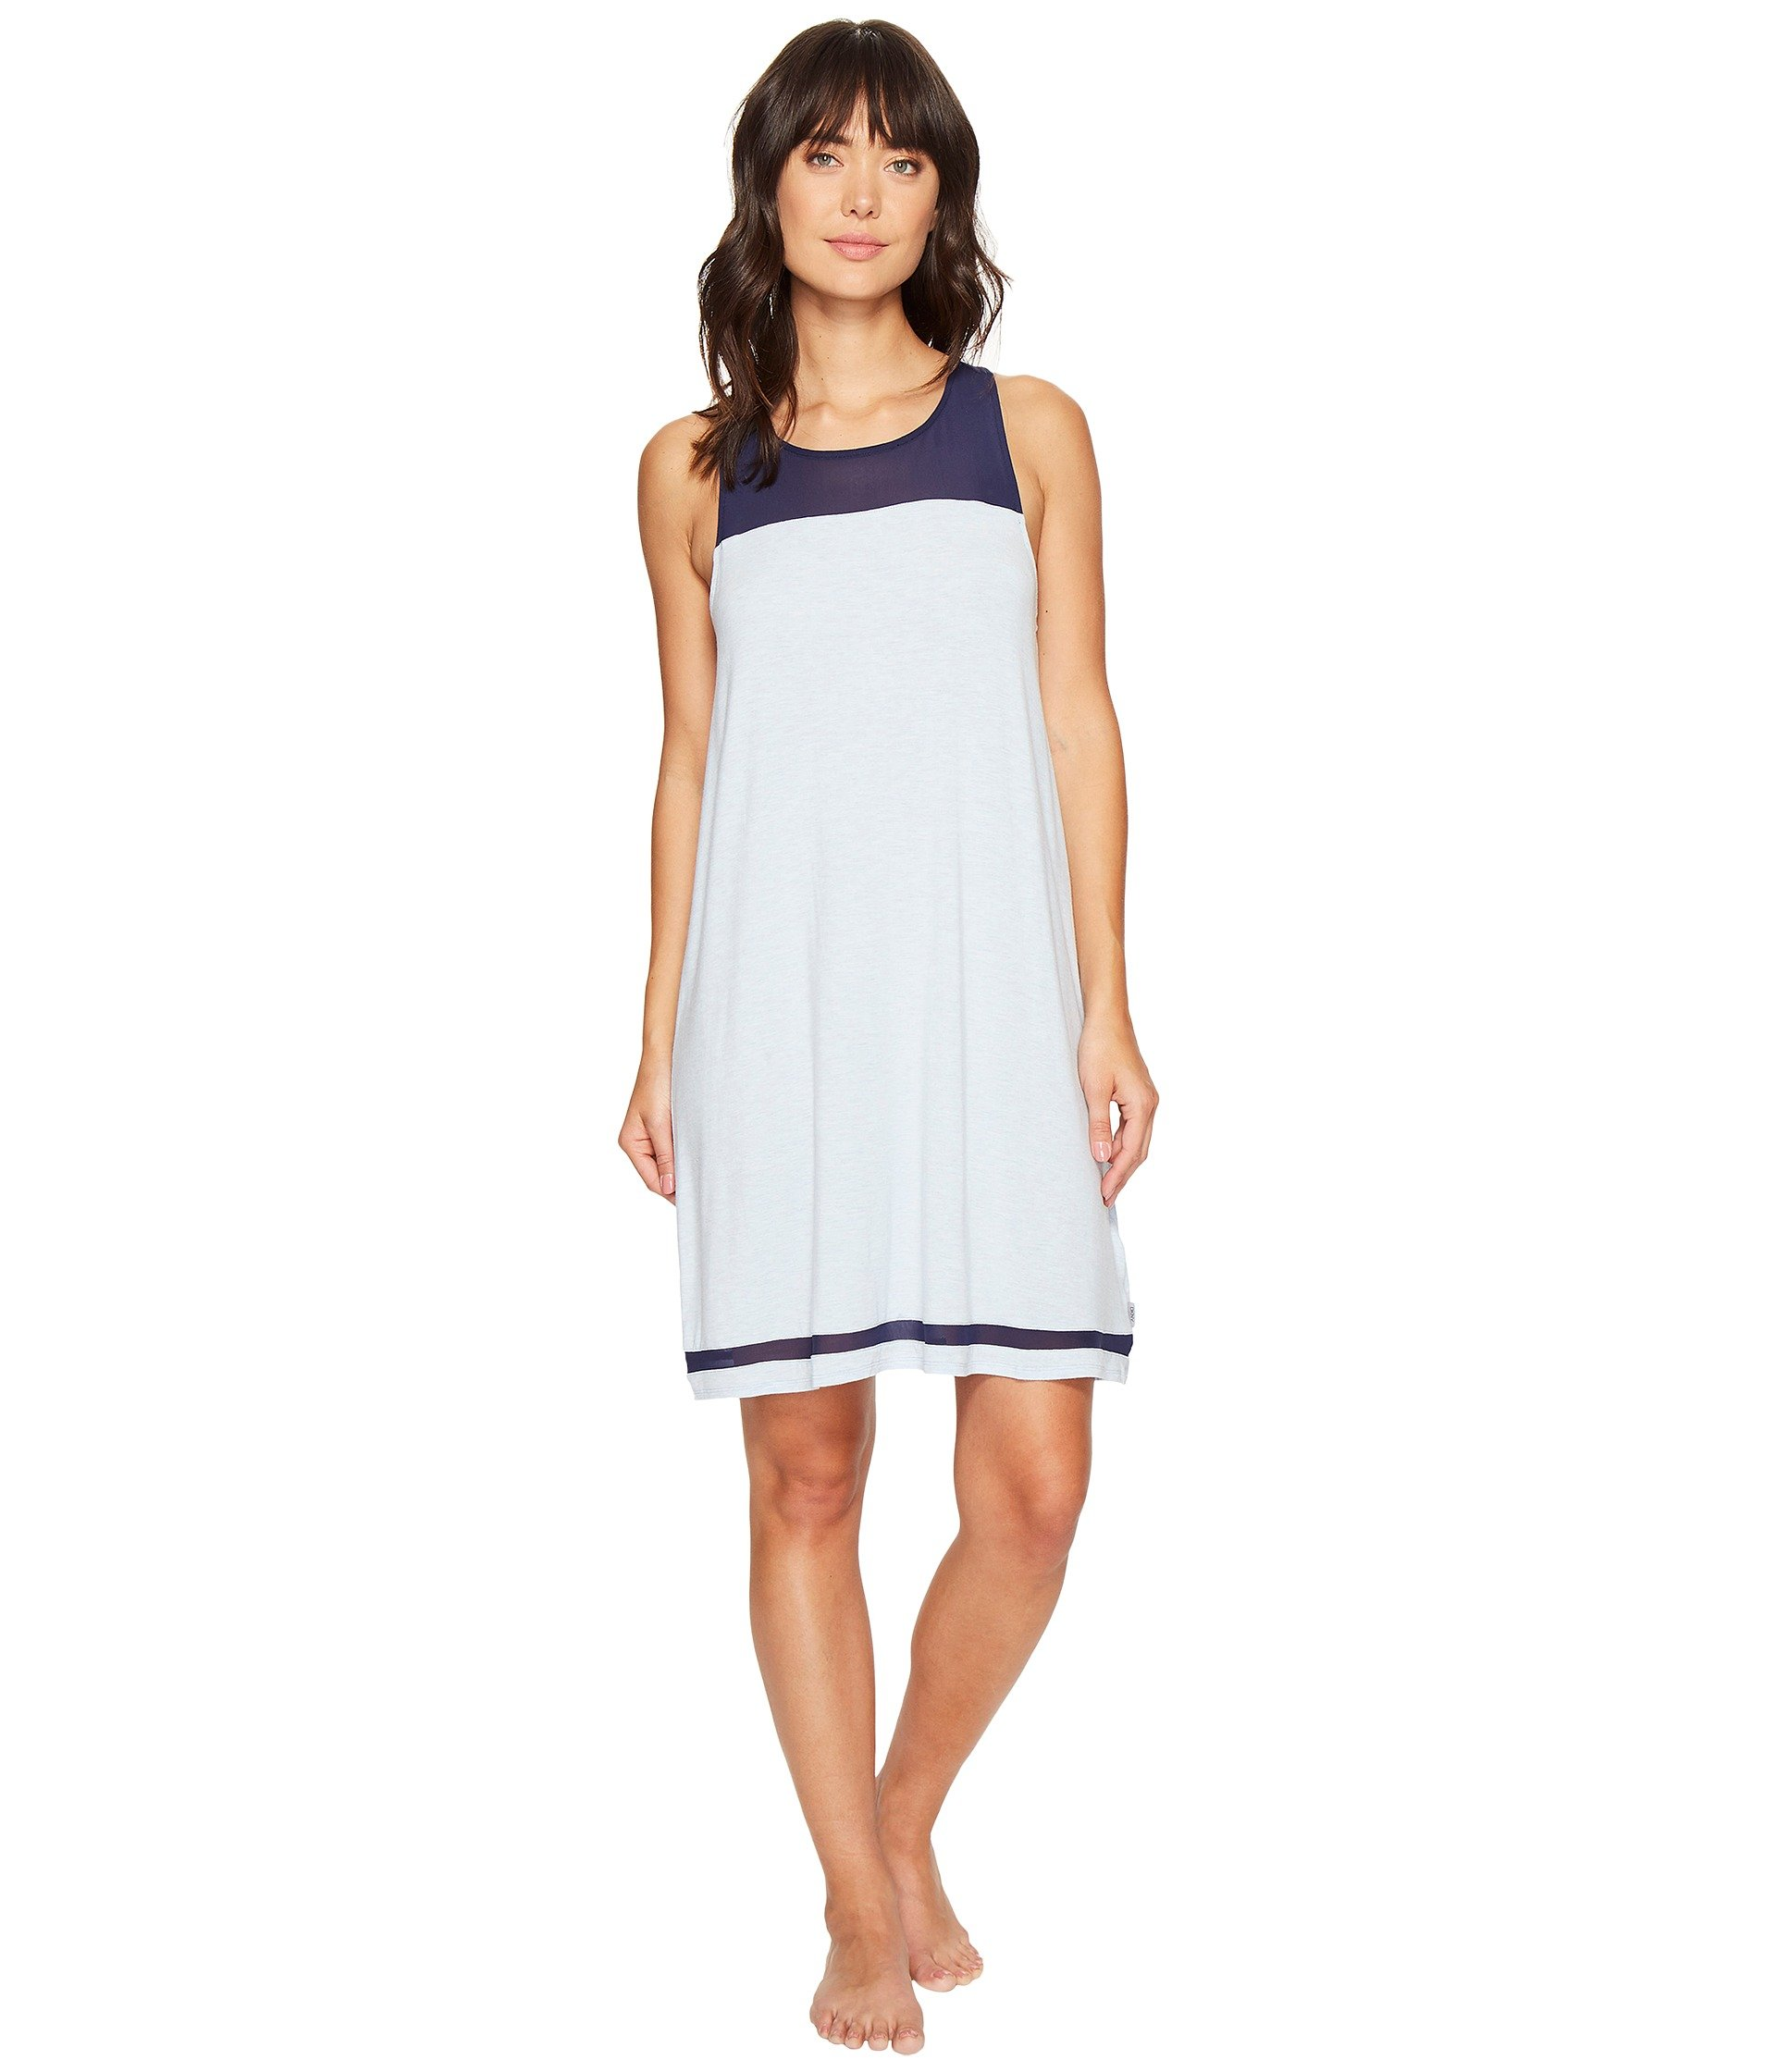 Babydoll DKNY Fashion Modal Spandex Jersey Short Chemise  + DKNY en VeoyCompro.net